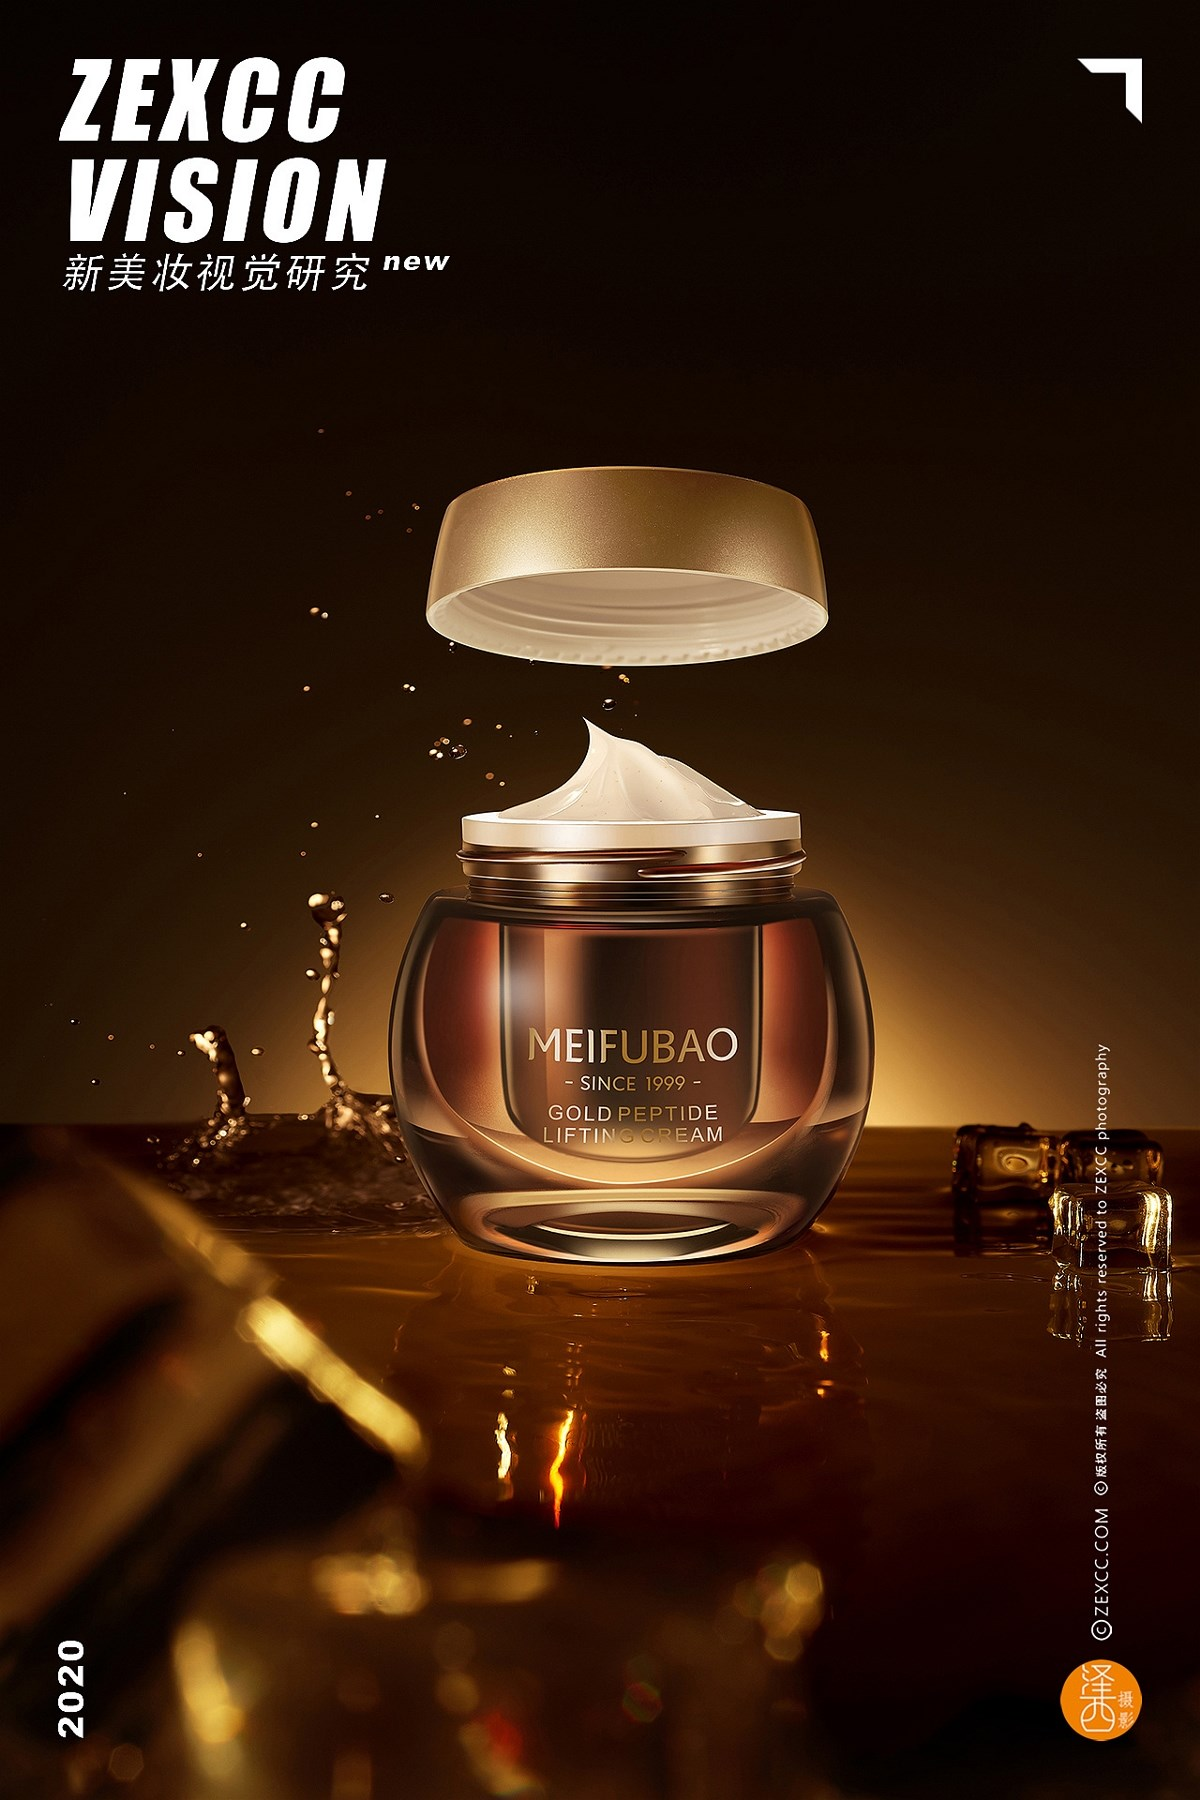 MEIFUBAO视觉2 ✖ 泽西摄影 | 新美妆视觉研究